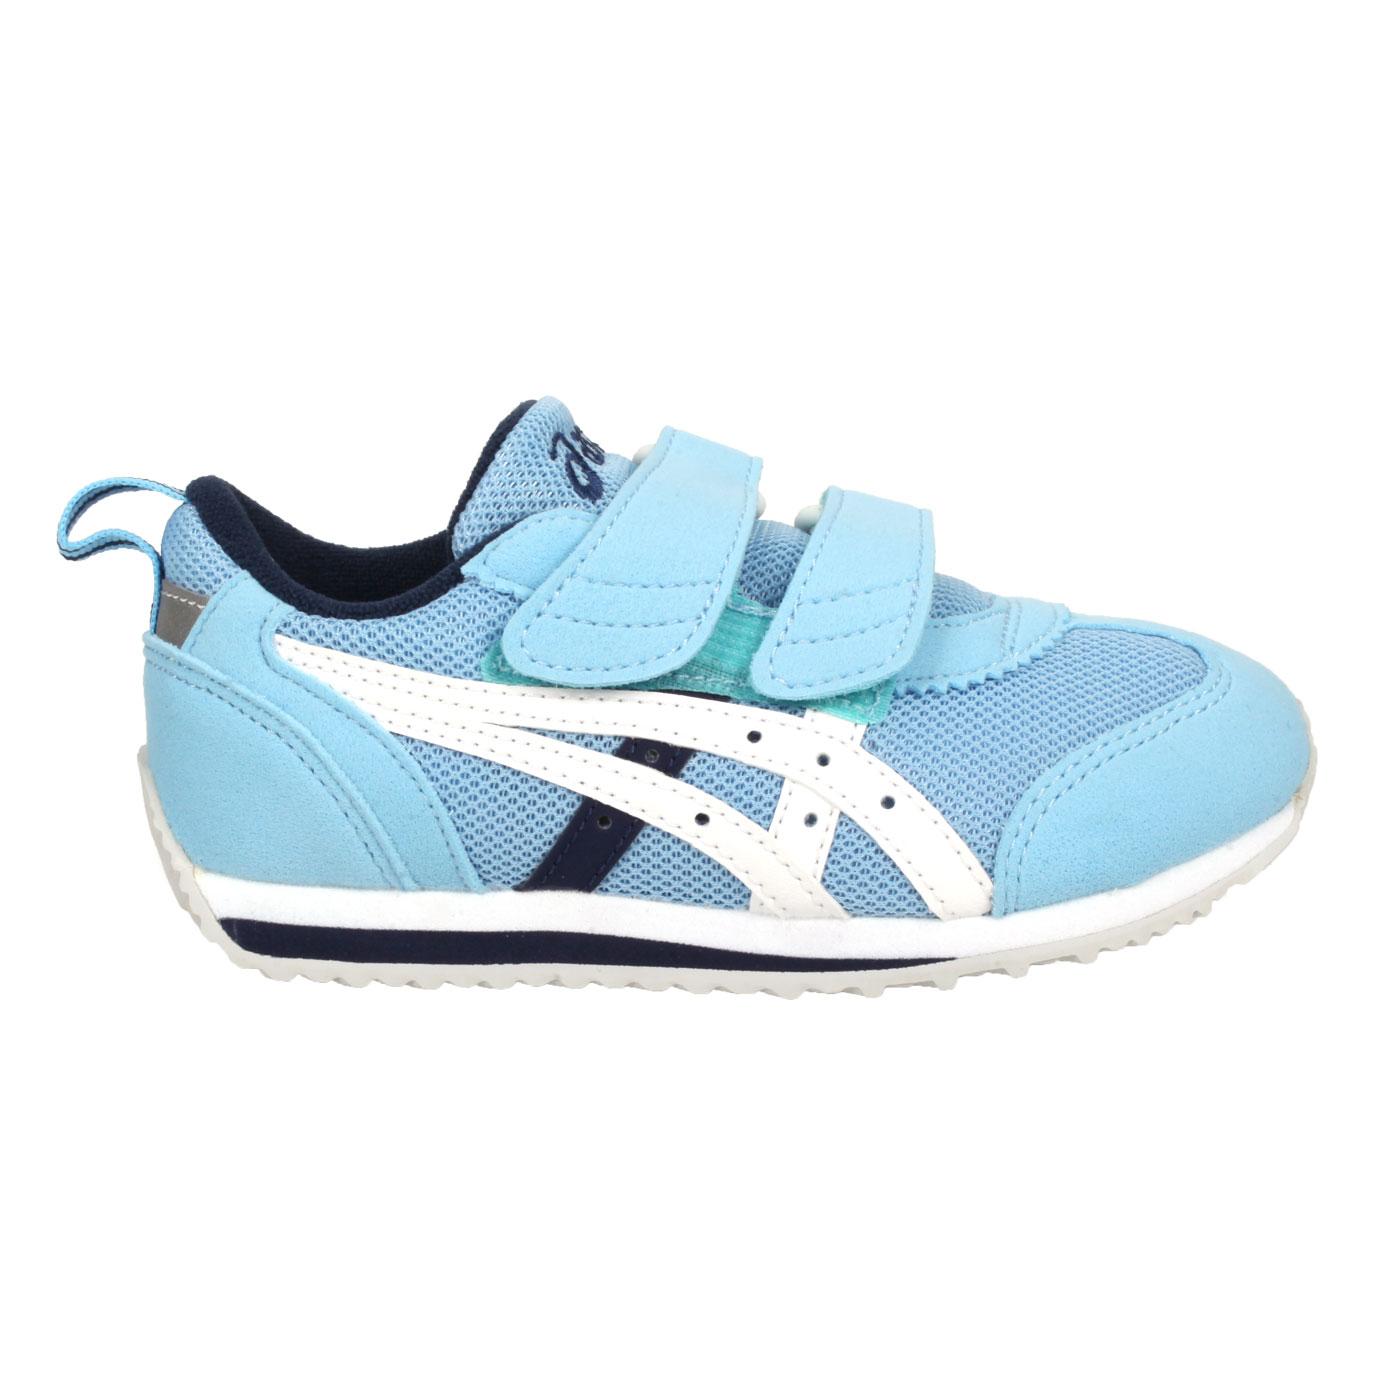 ASICS 中童運動鞋  @IDAHO MINI 3@TUM186-402